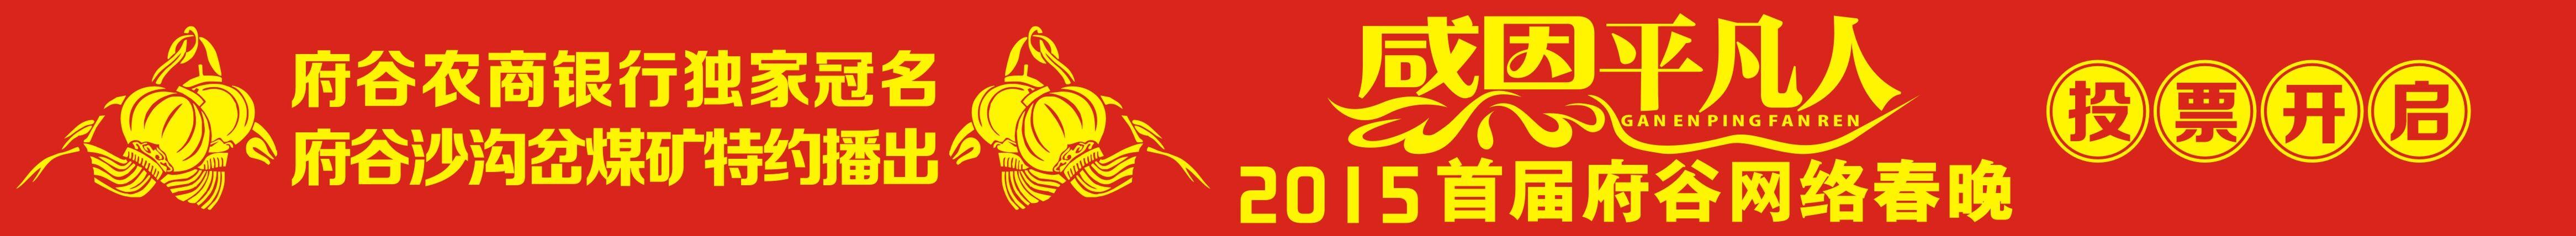 http://p2.pccoo.cn/vote/20150209/2015020909470940972416.jpg